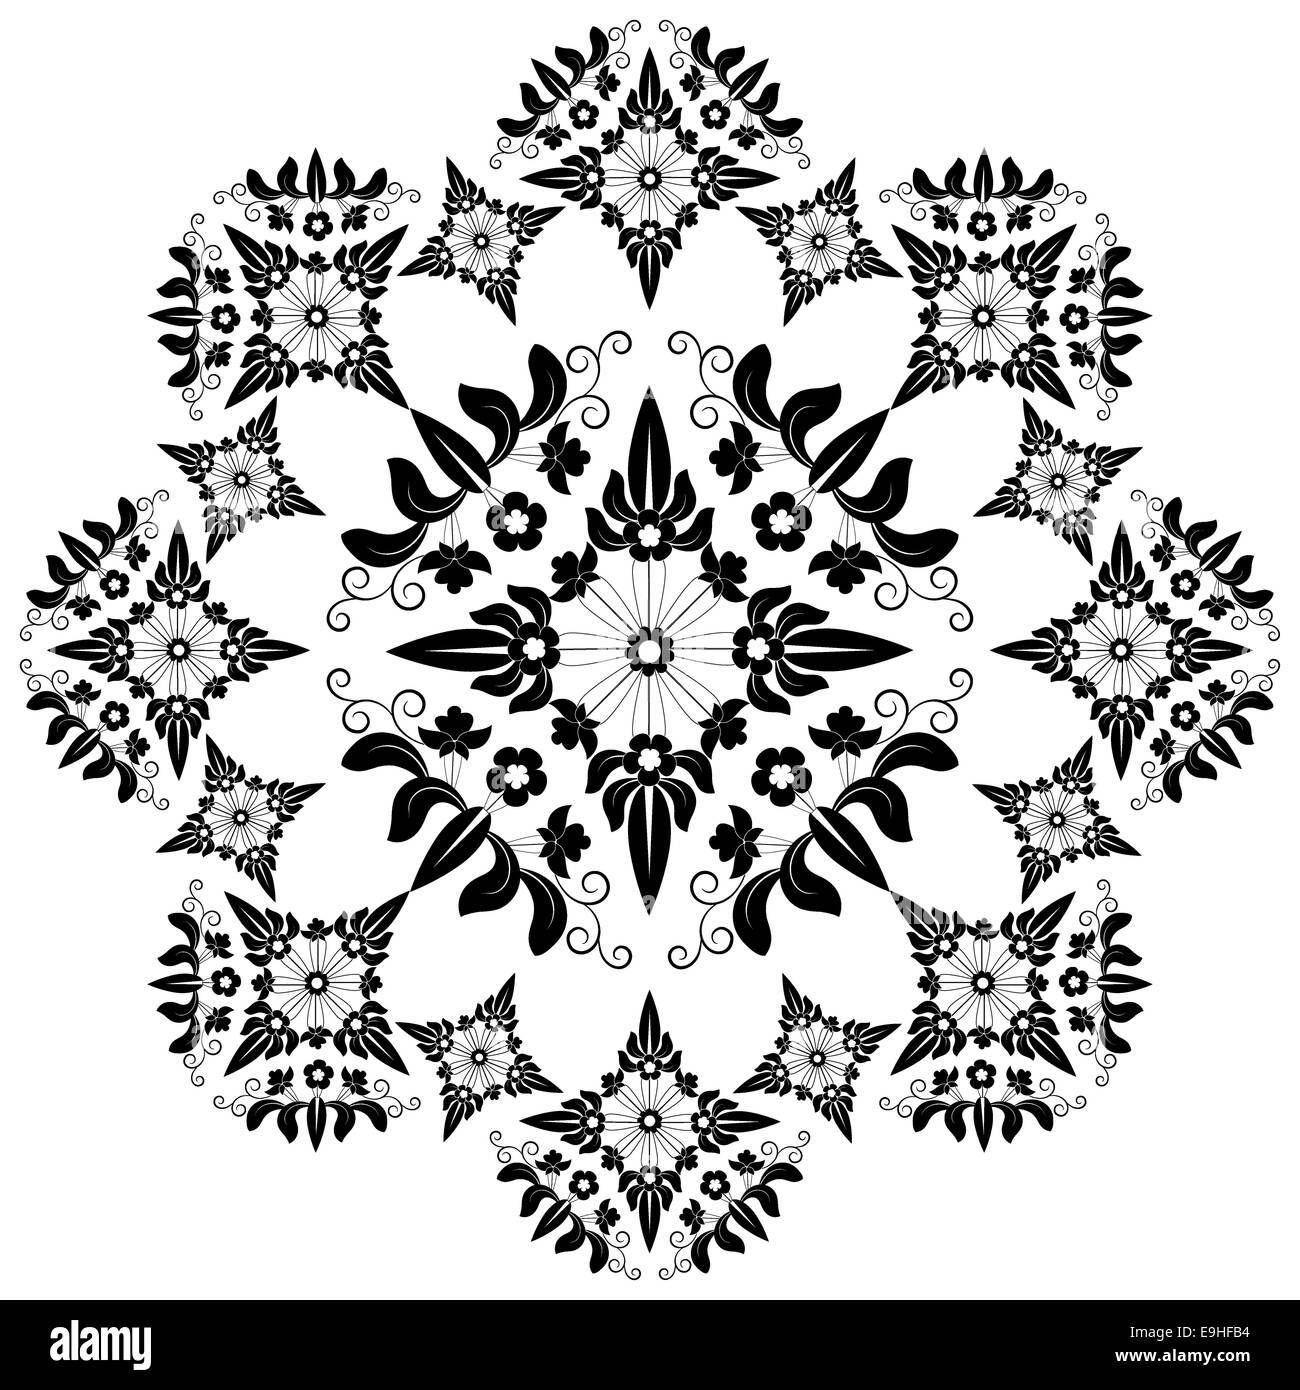 circuler design version - Stock Image